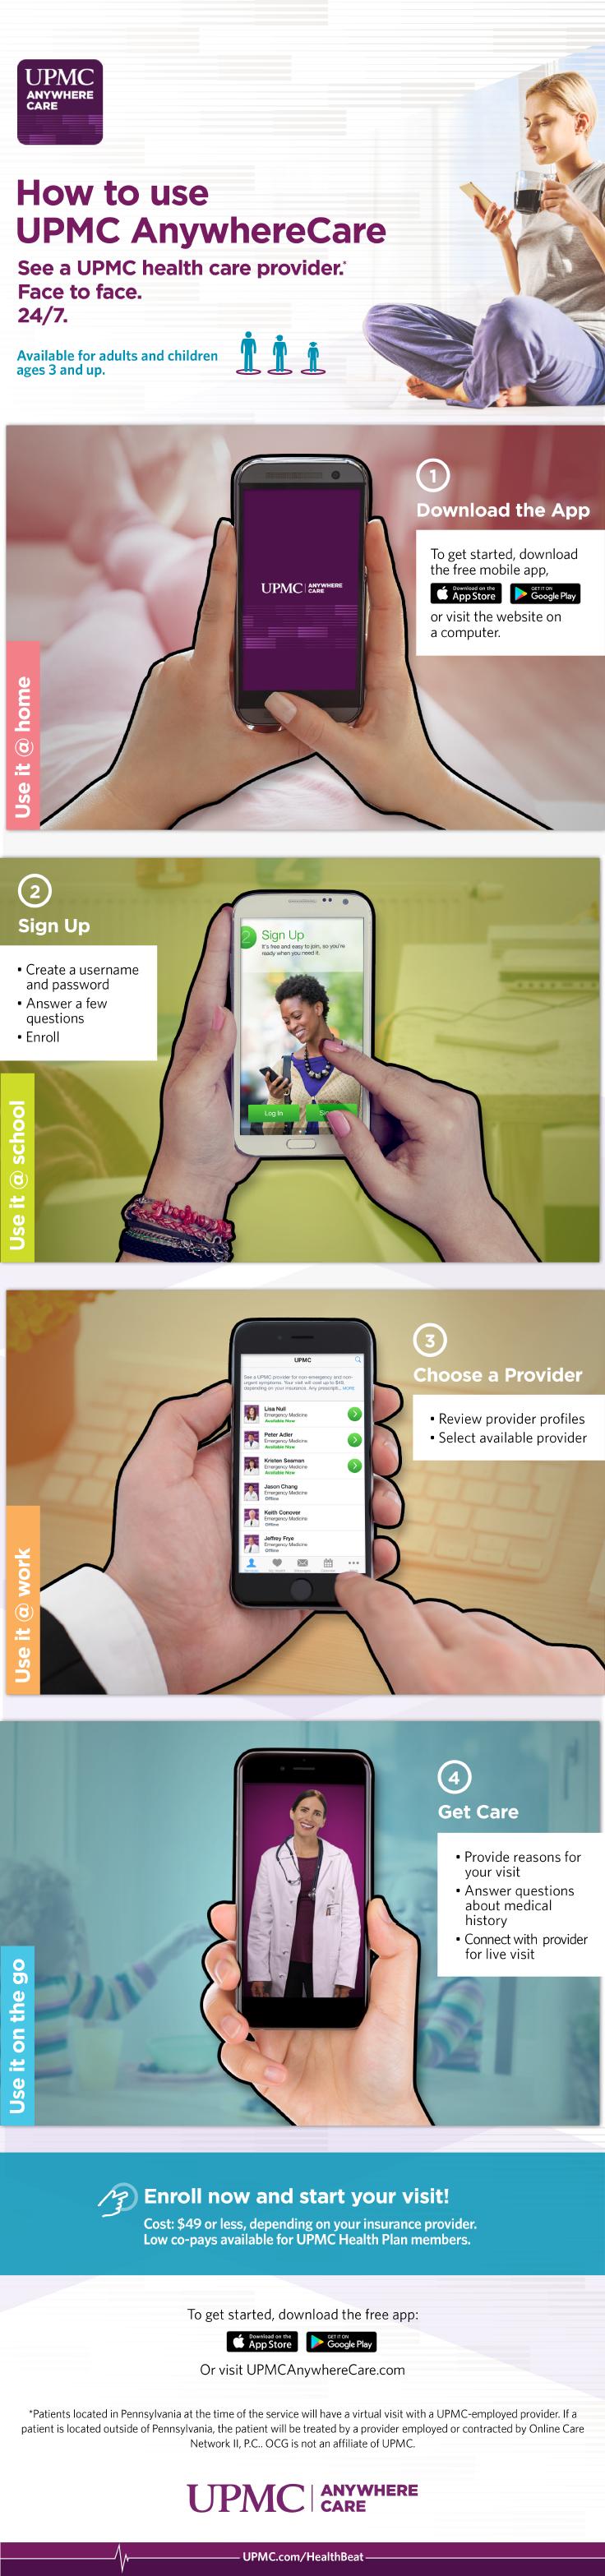 Get care 24 7 with upmc anywherecare upmc healthbeat